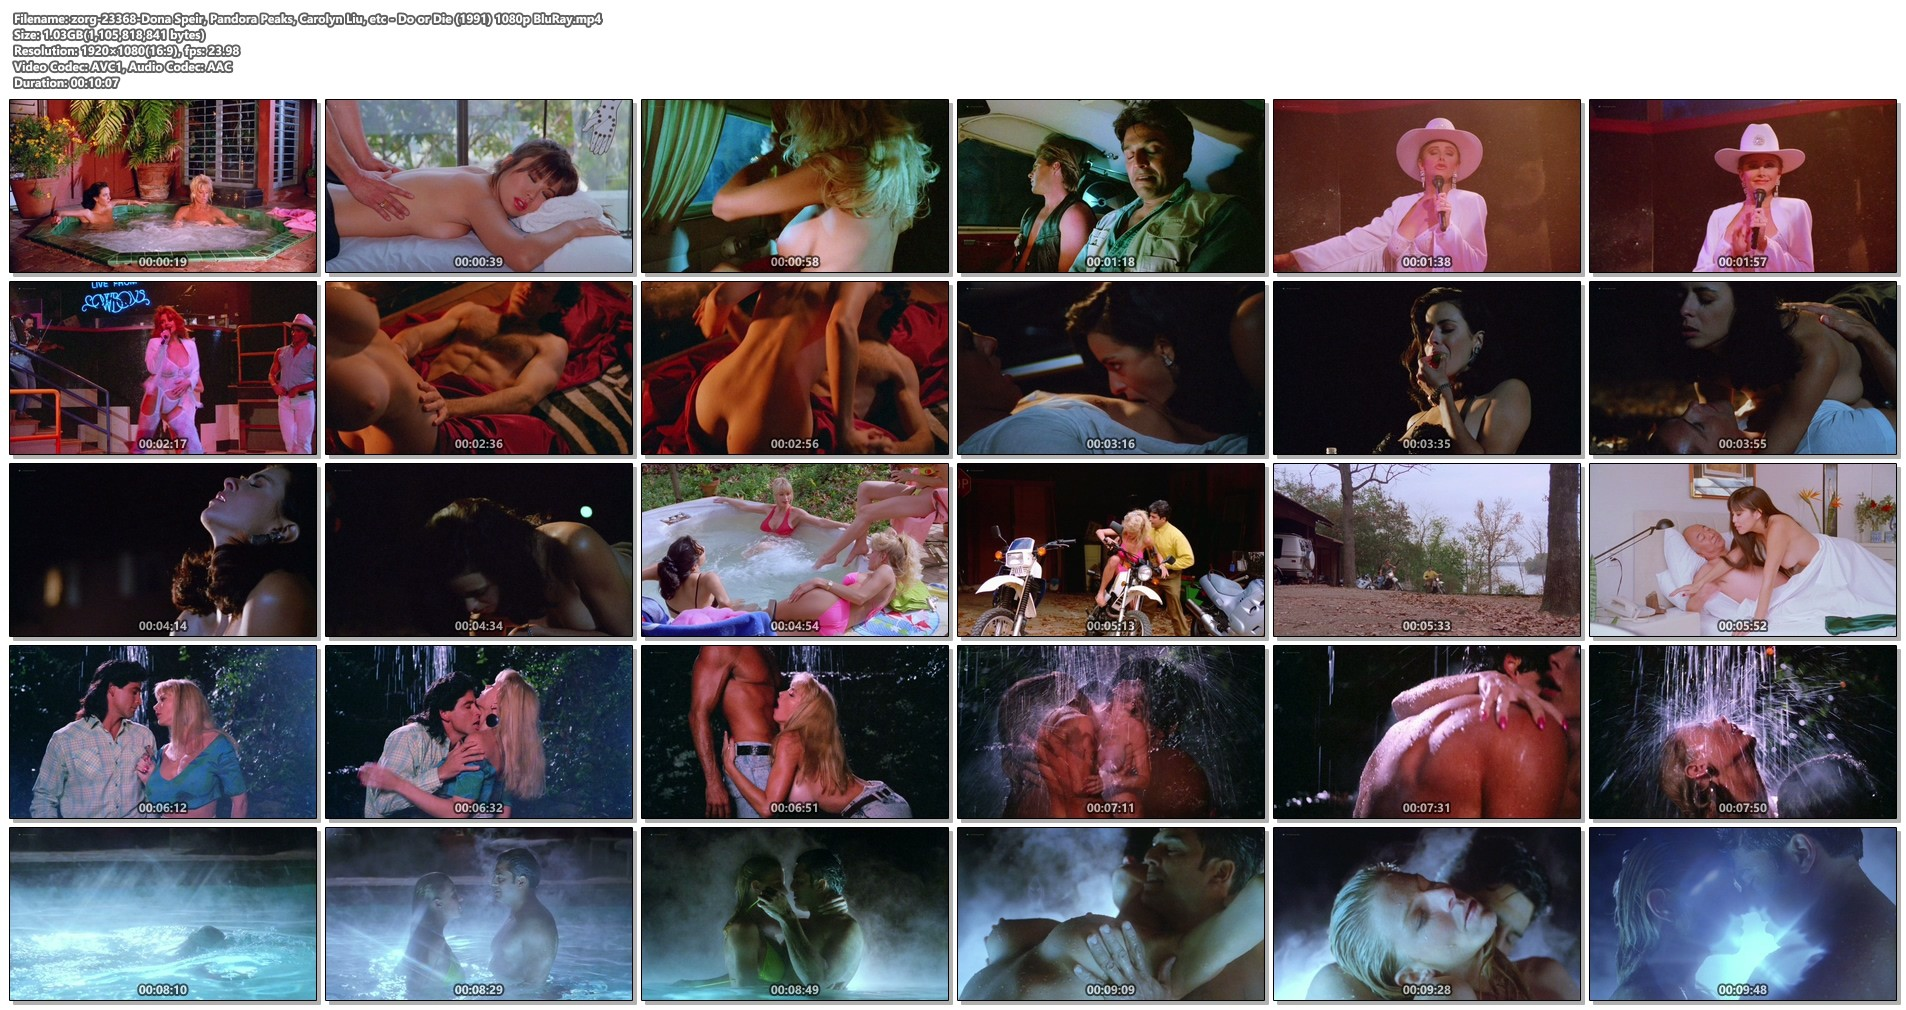 Dona Speir nude Pandora Peaks, Carolyn Liu and others nude too - Do or Die (1991) 1080p BluRay (1)